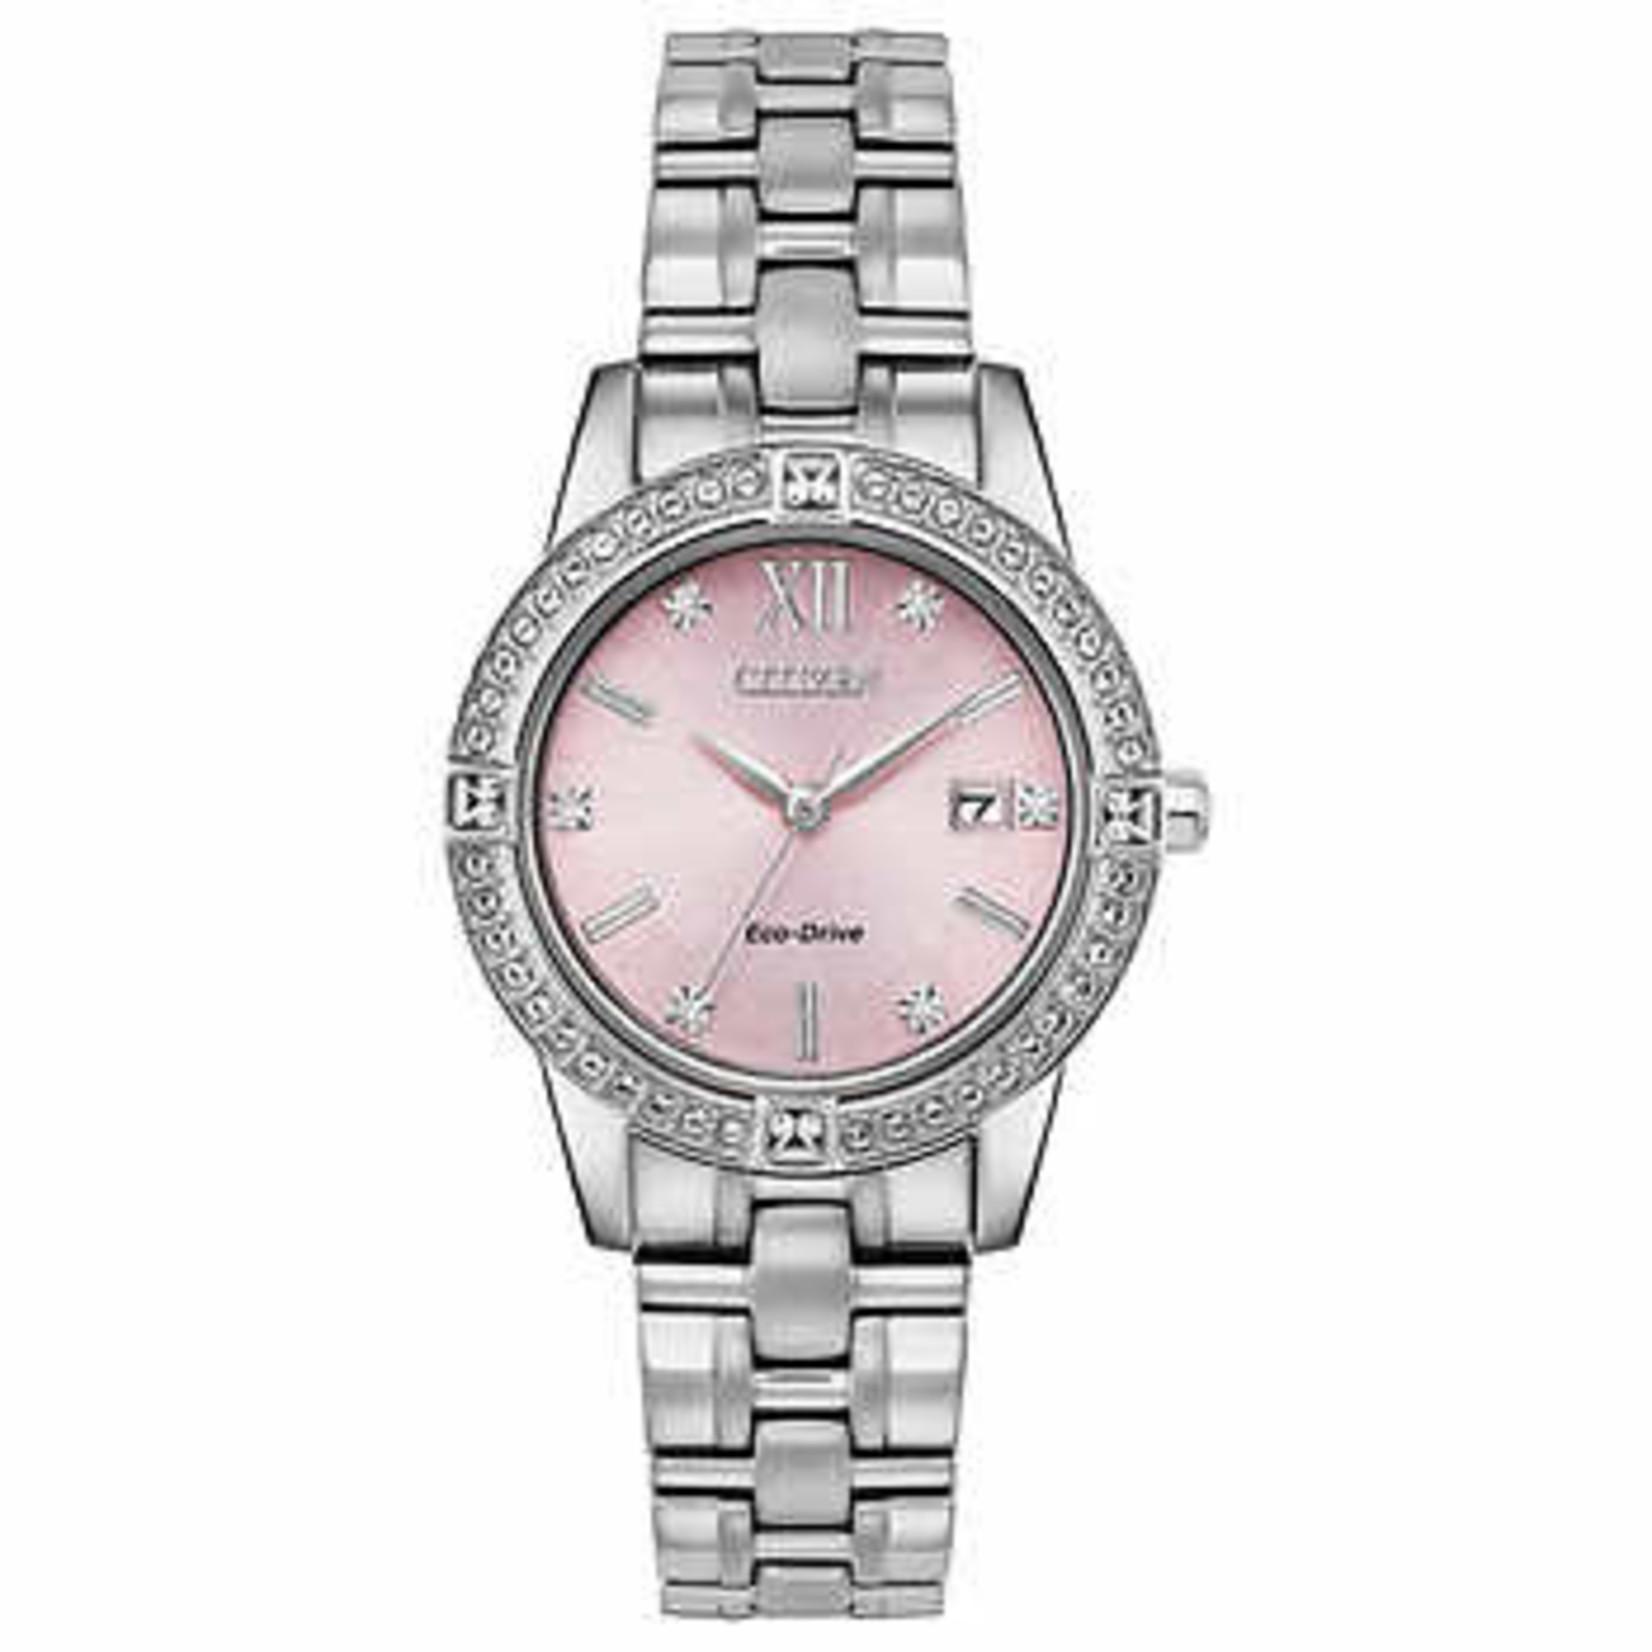 Citizen Ladies Pink Dial Watch *Grade A